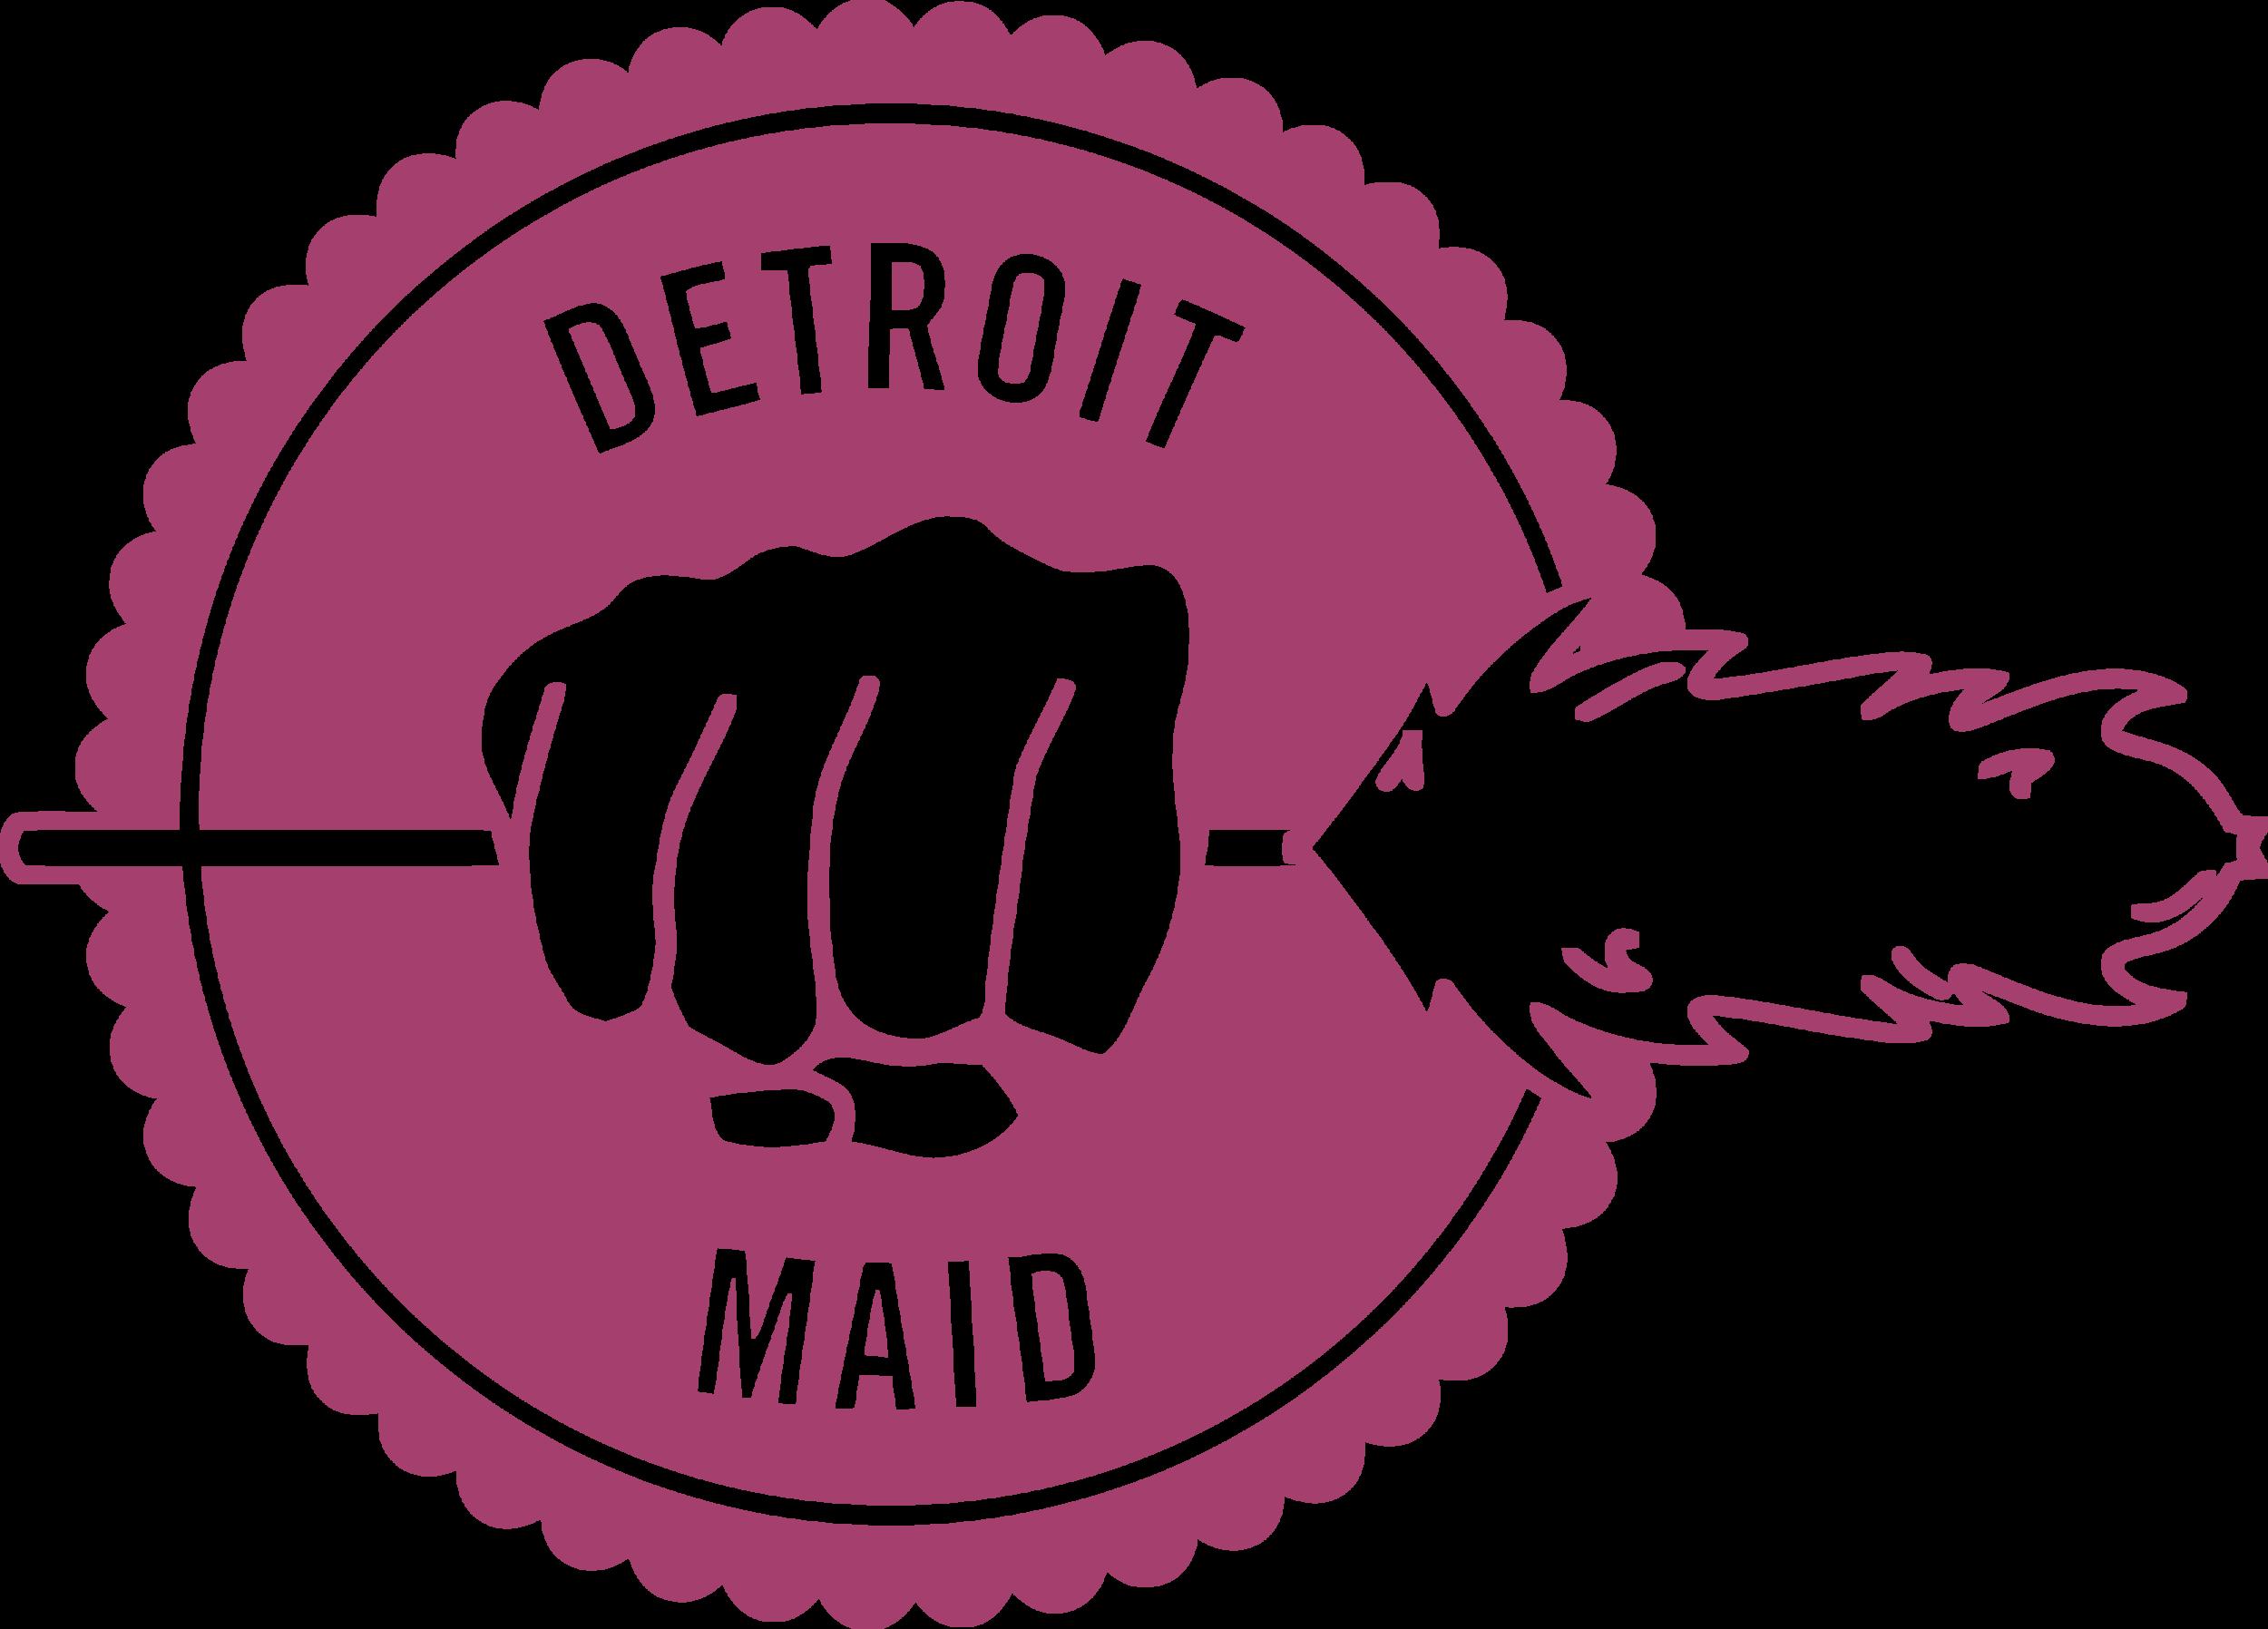 Detroit Maid.png